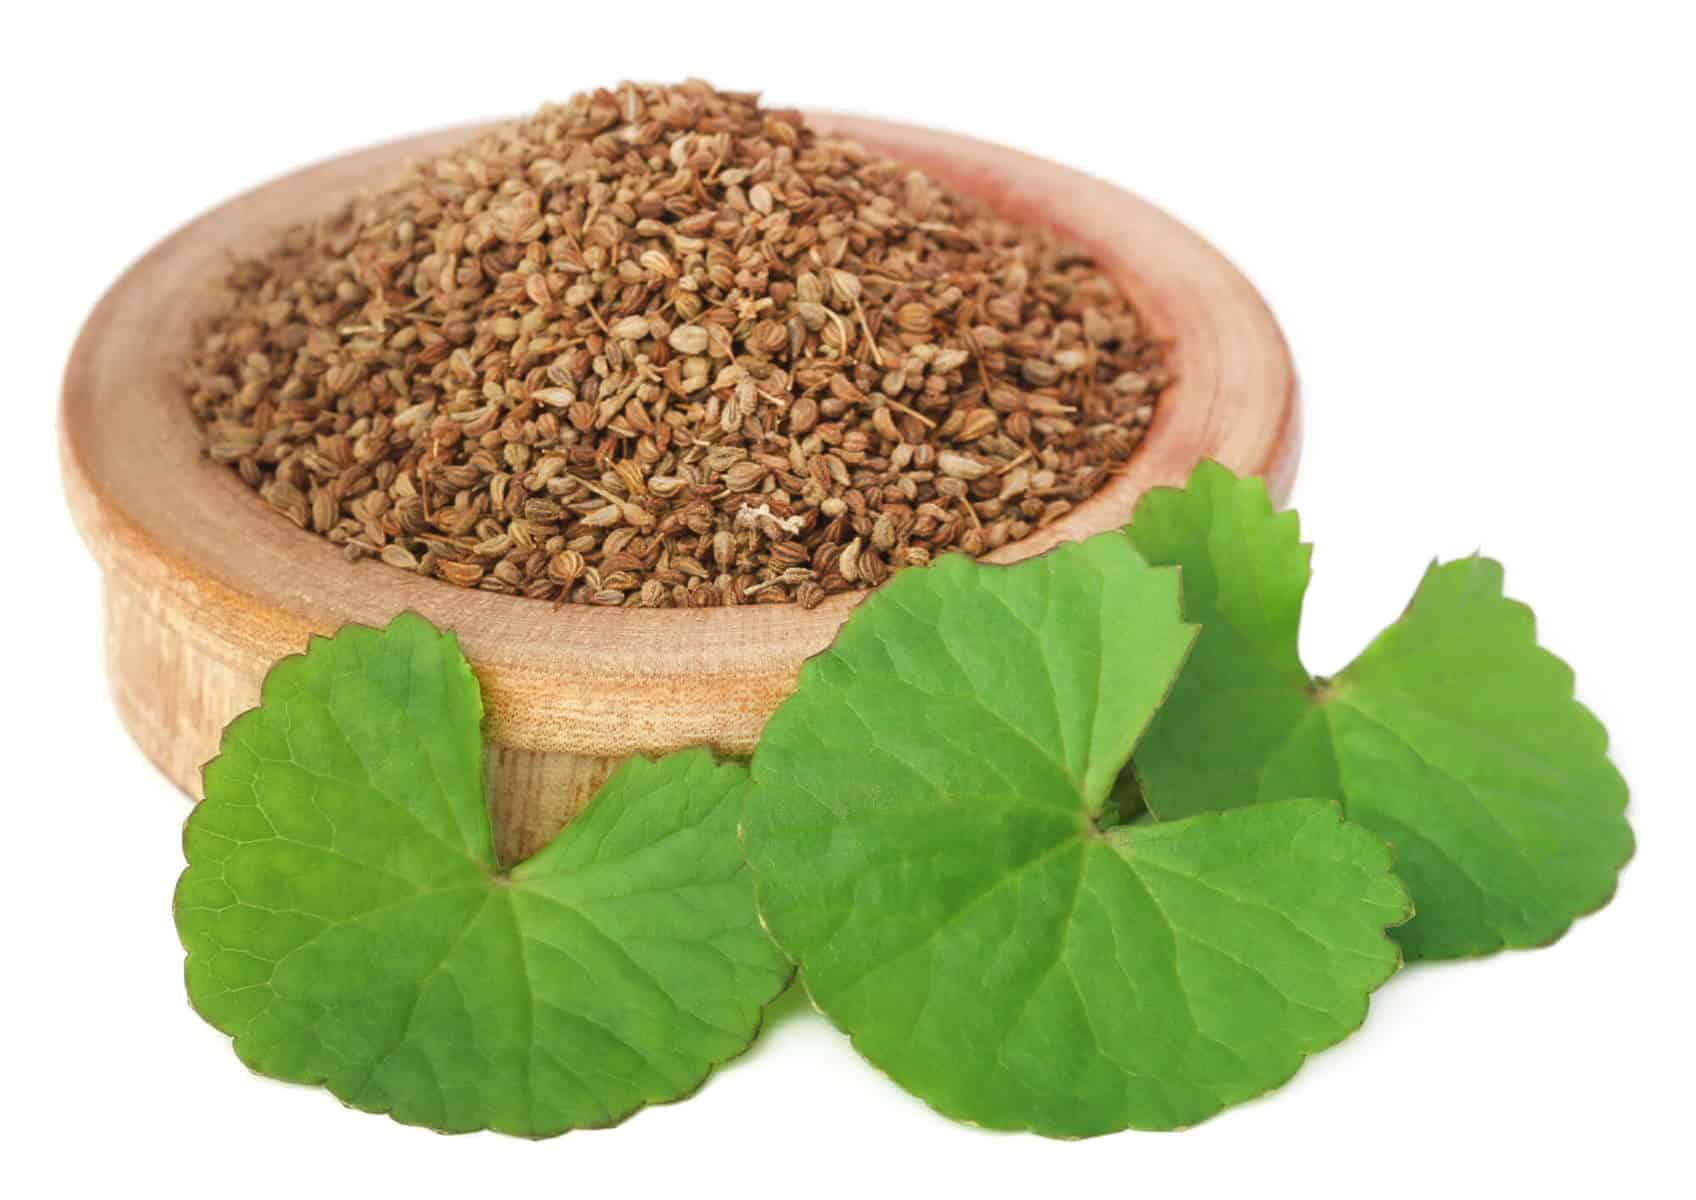 Ajwain/ajowan seeds with thankuni leaves